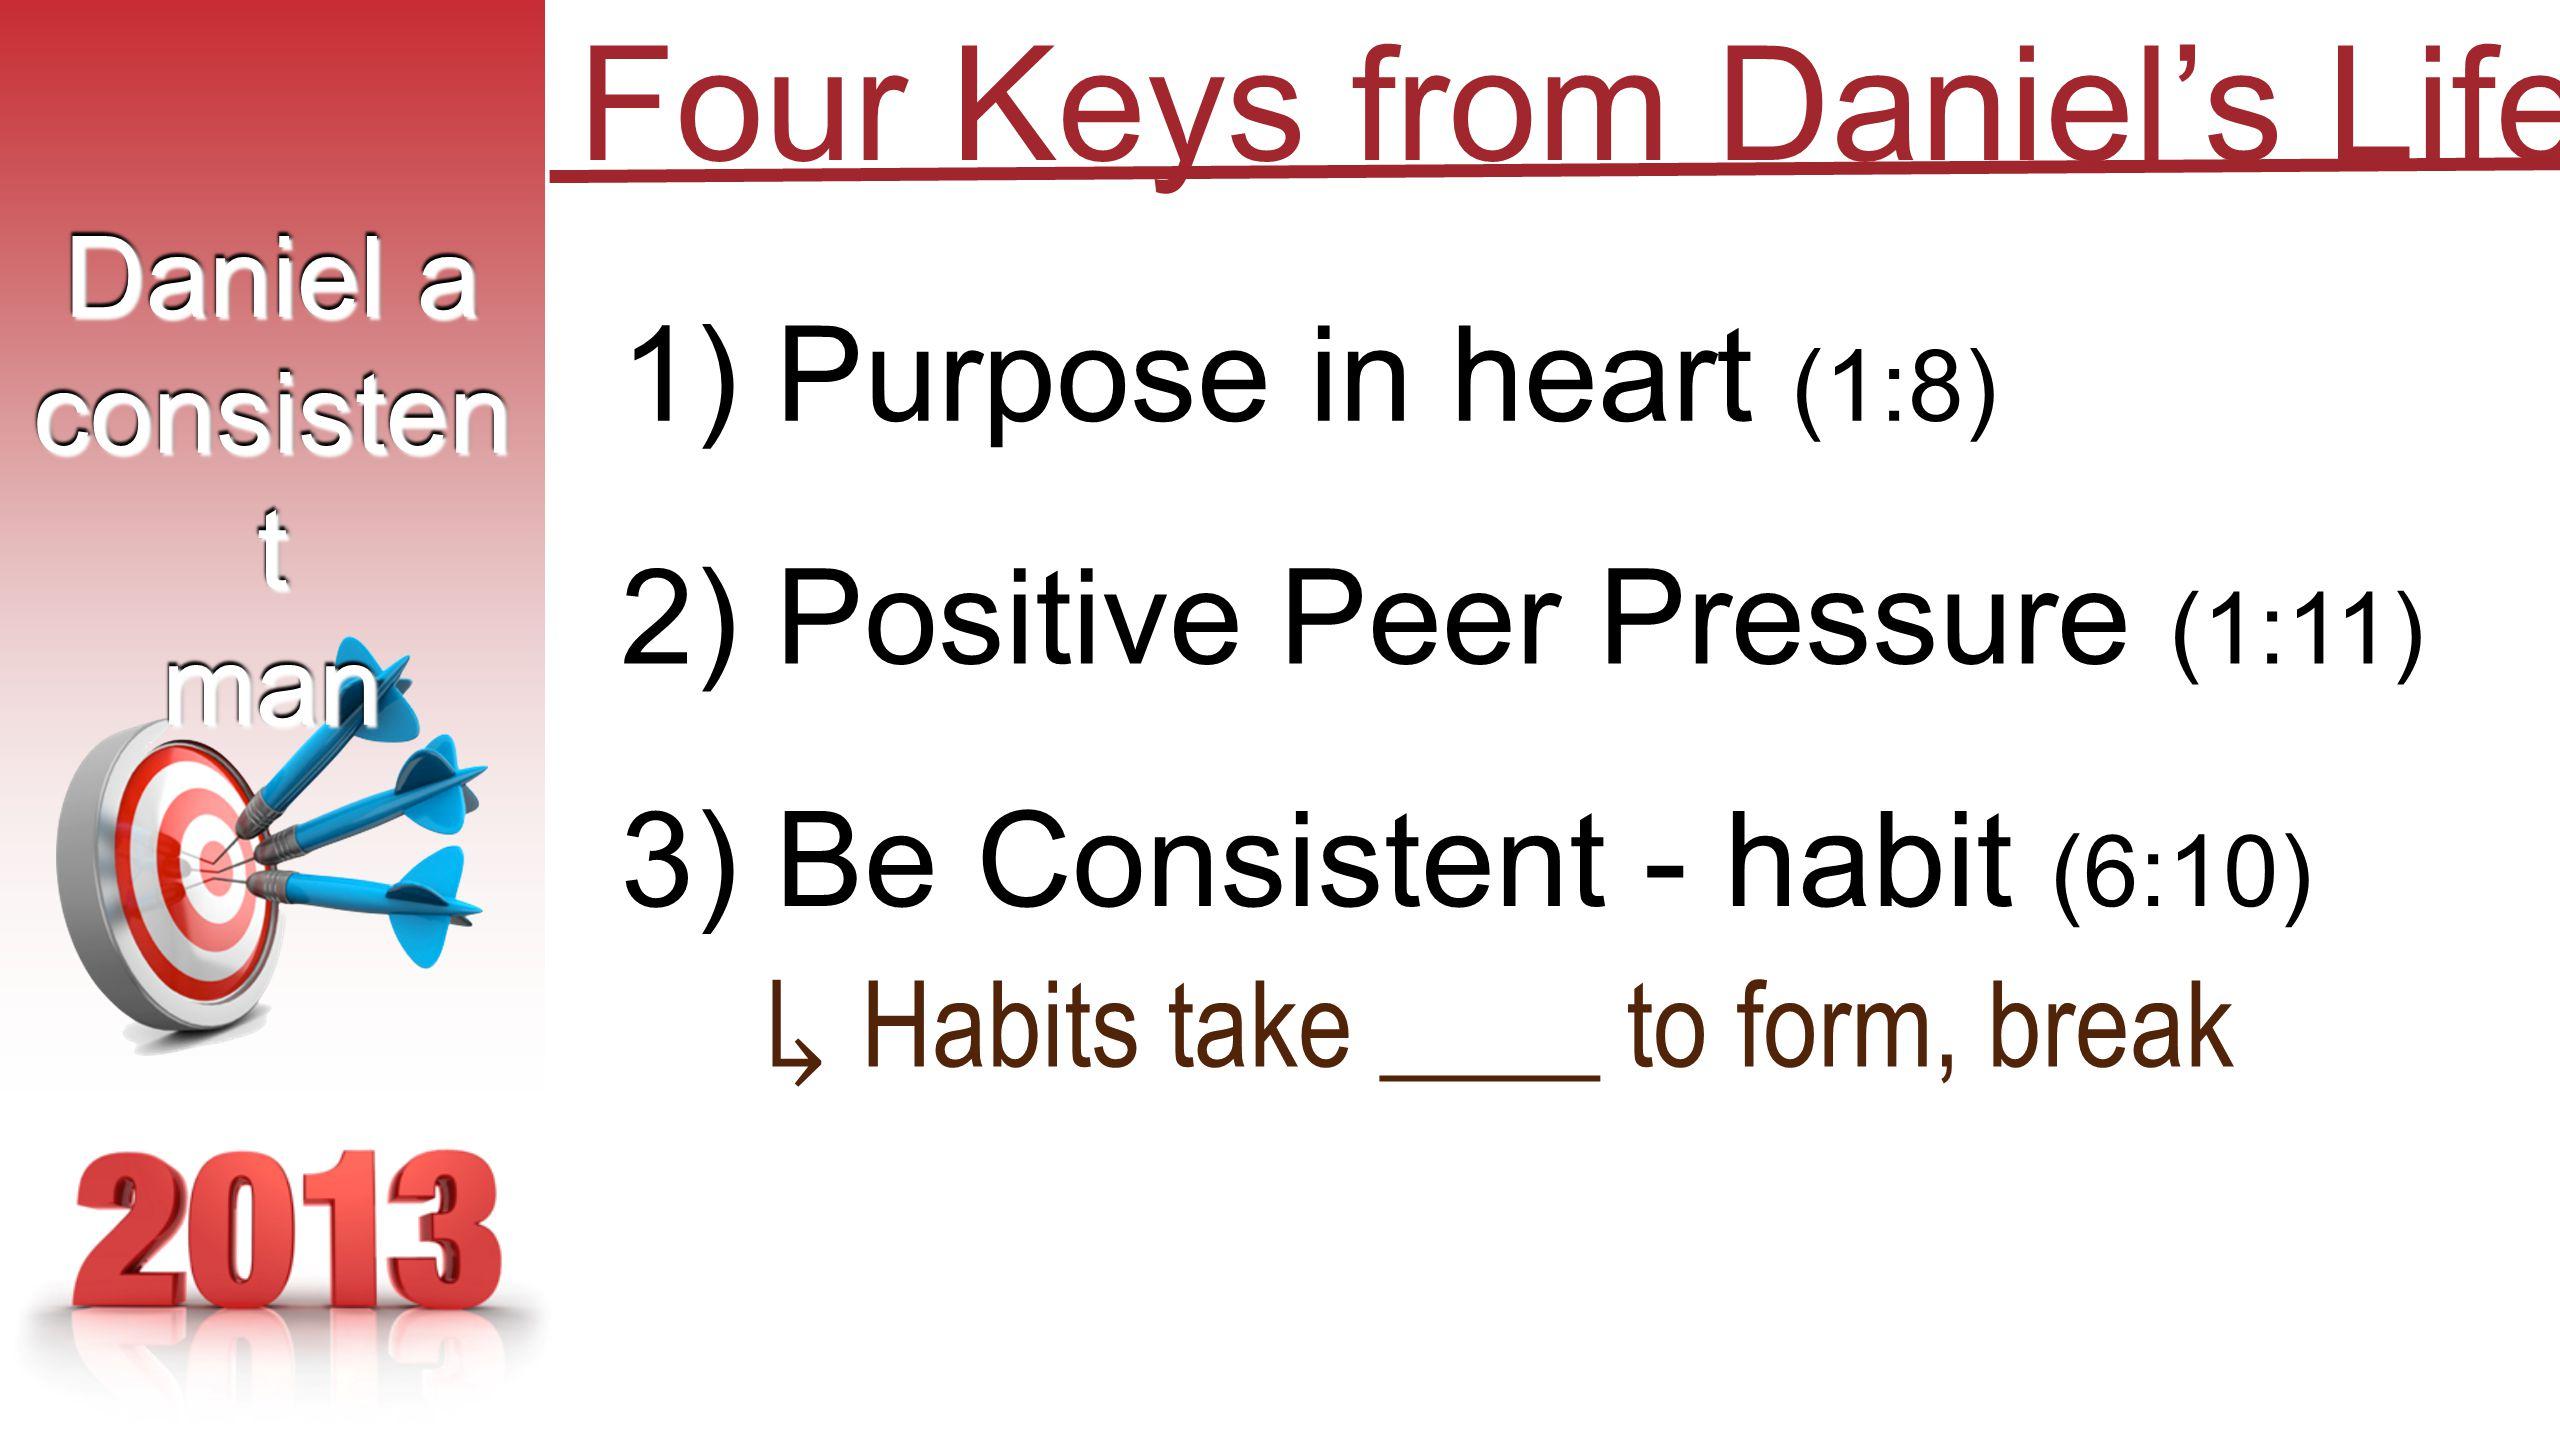 1) Purpose in heart (1:8) 2) Positive Peer Pressure (1:11) 3) Be Consistent - habit (6:10) Daniel a consisten t man Daniel a consisten t man Four Keys from Daniel's Life ↳ Habits take ____ to form, break